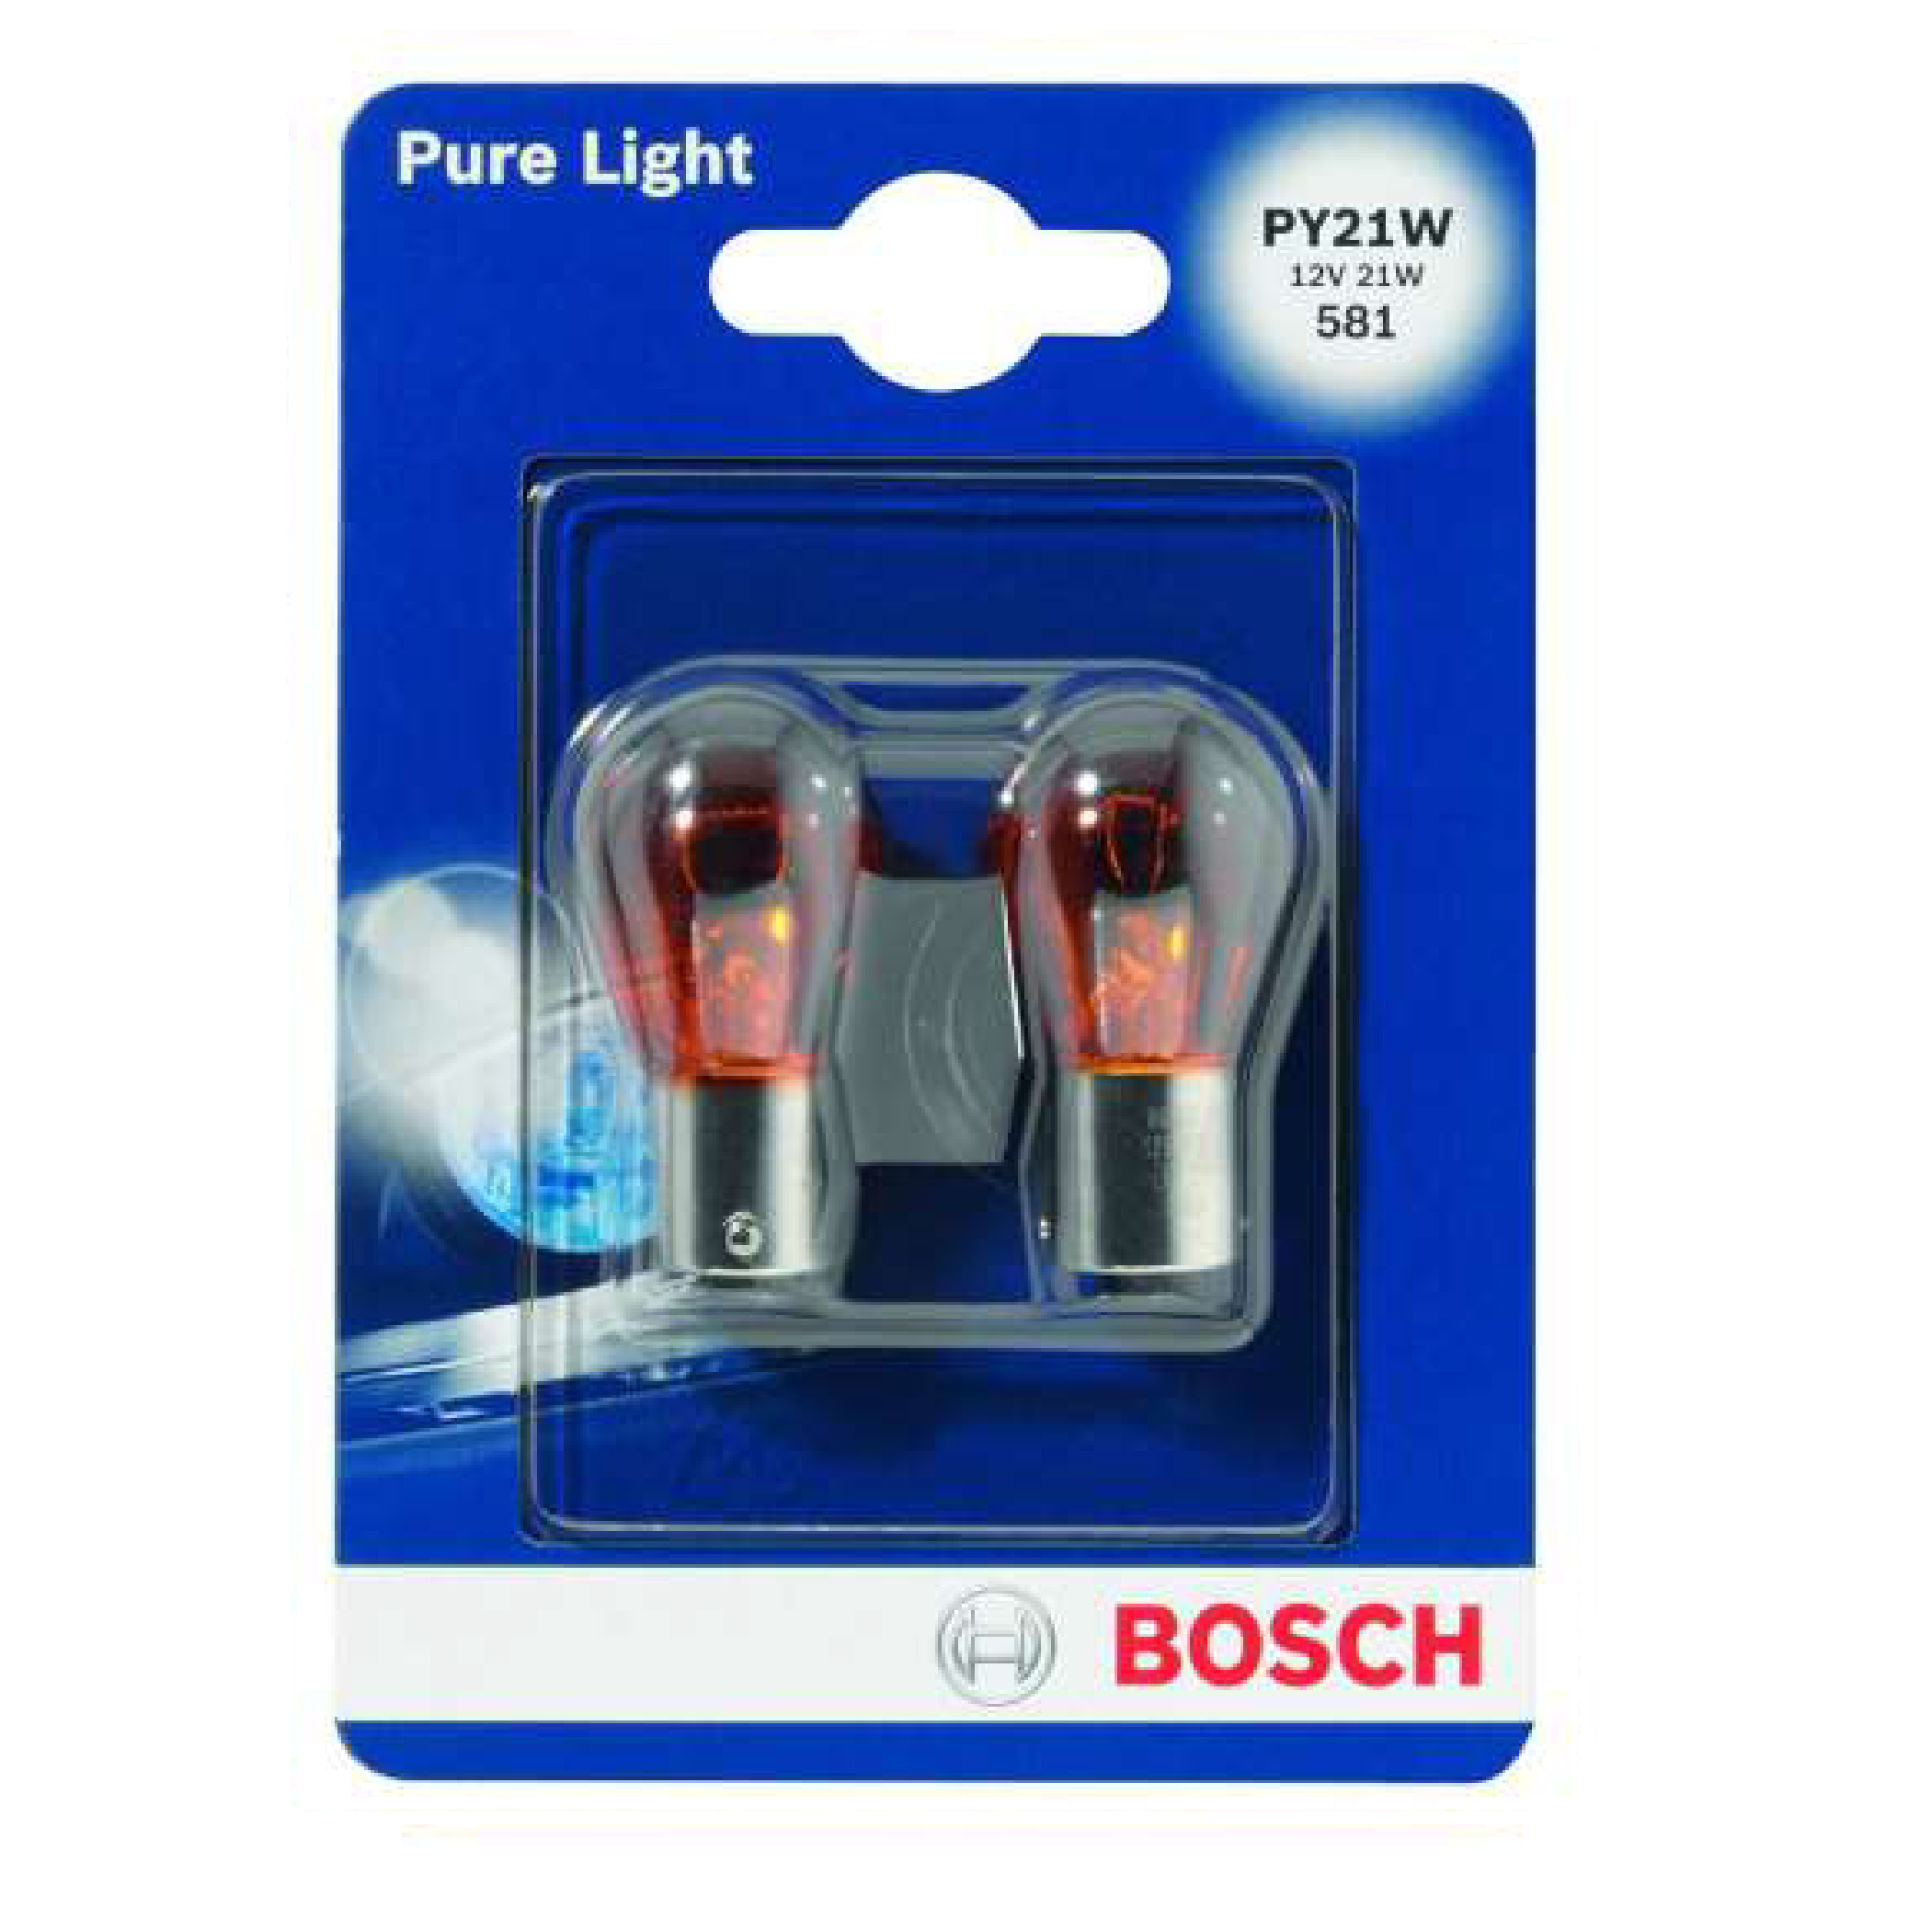 BOSCH 2 LAMP PY21W 018Bosch